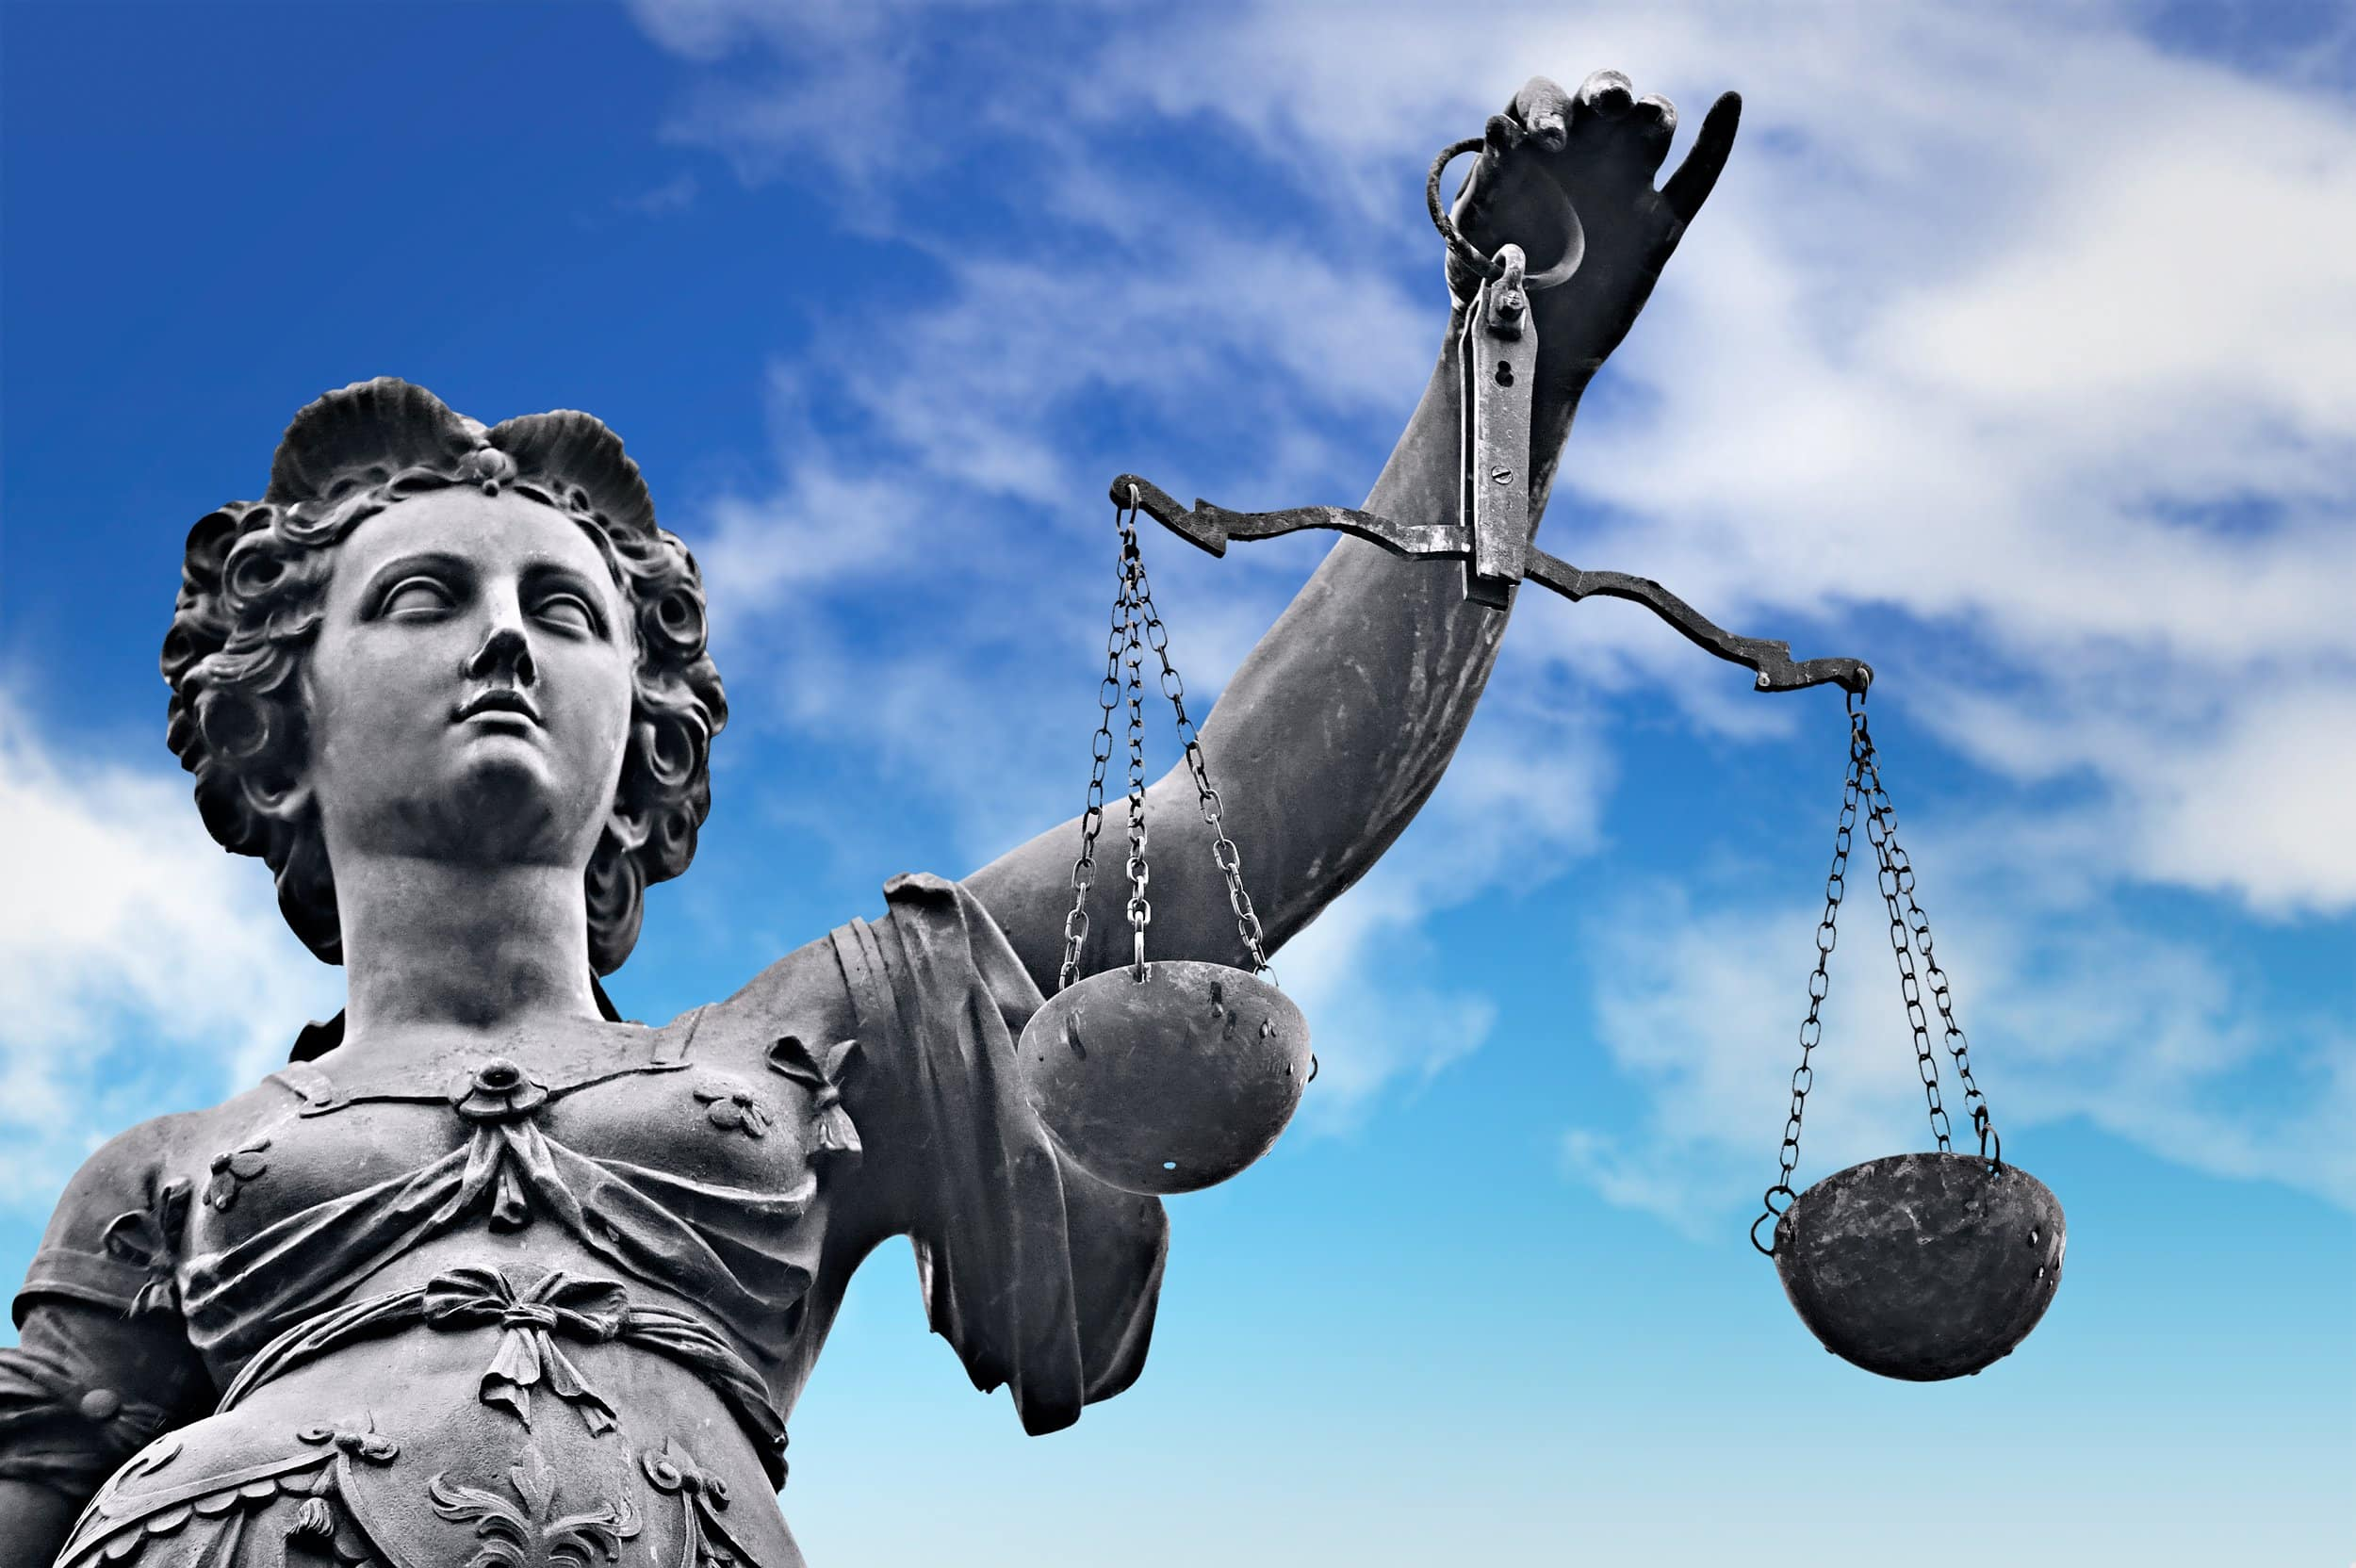 justice-as-balance-not-revenge